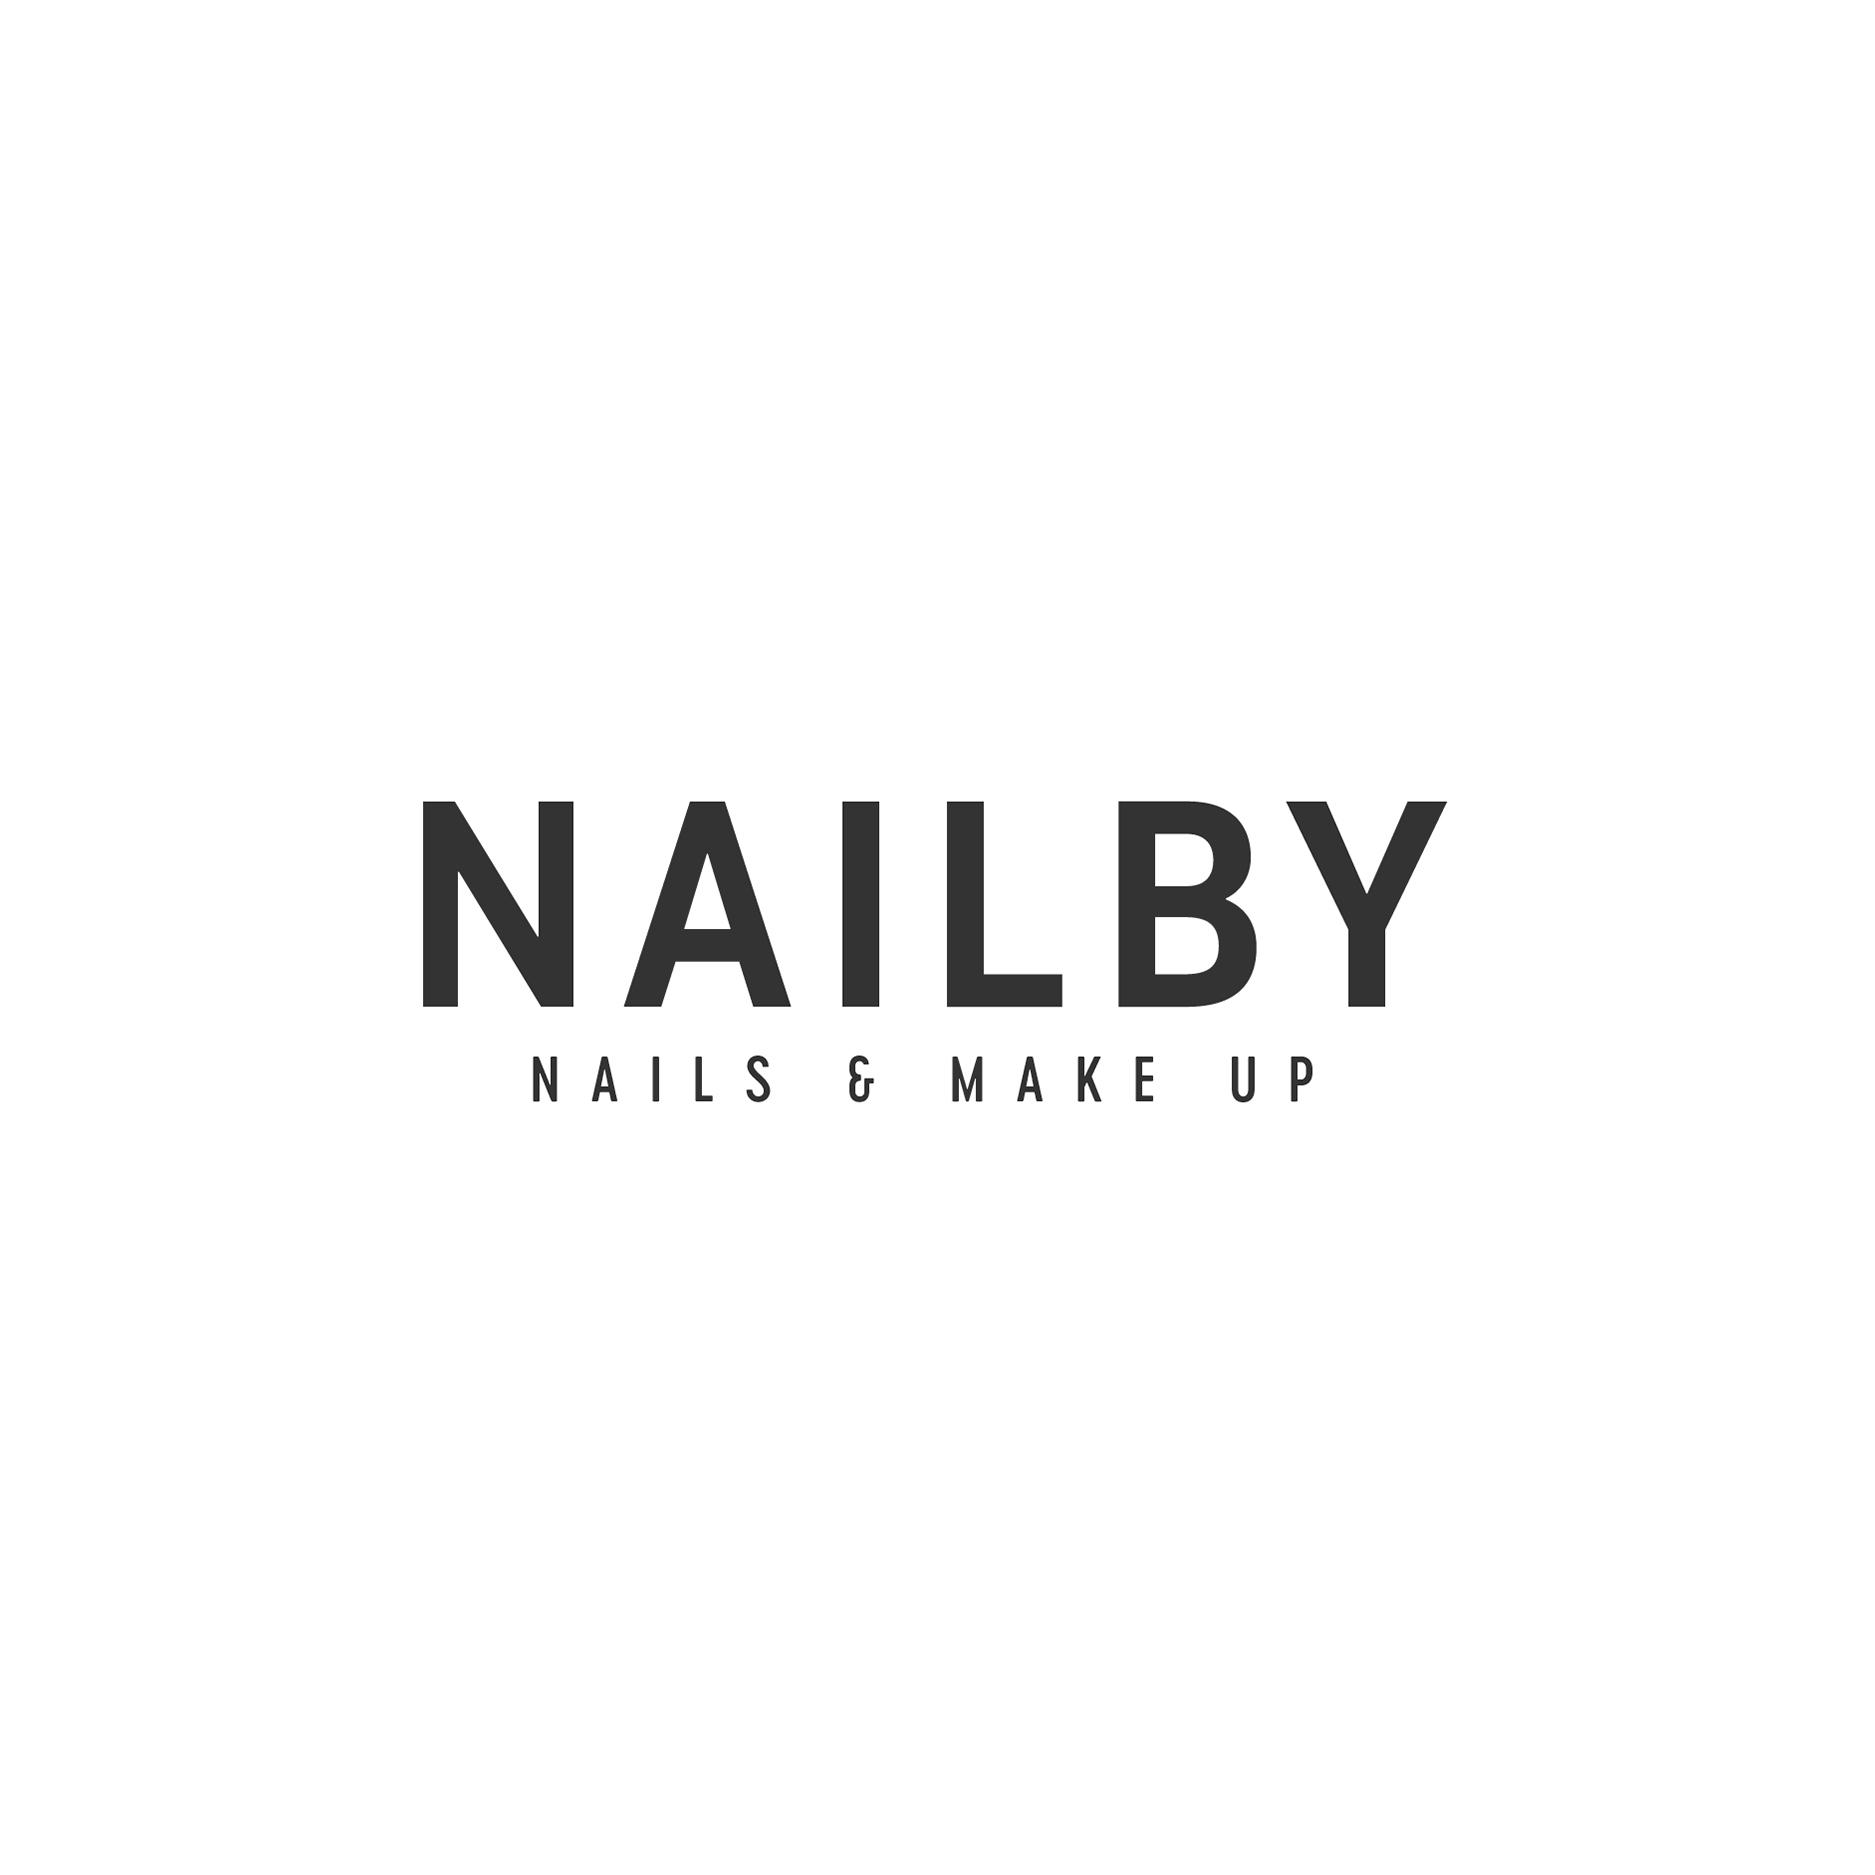 NAILBY